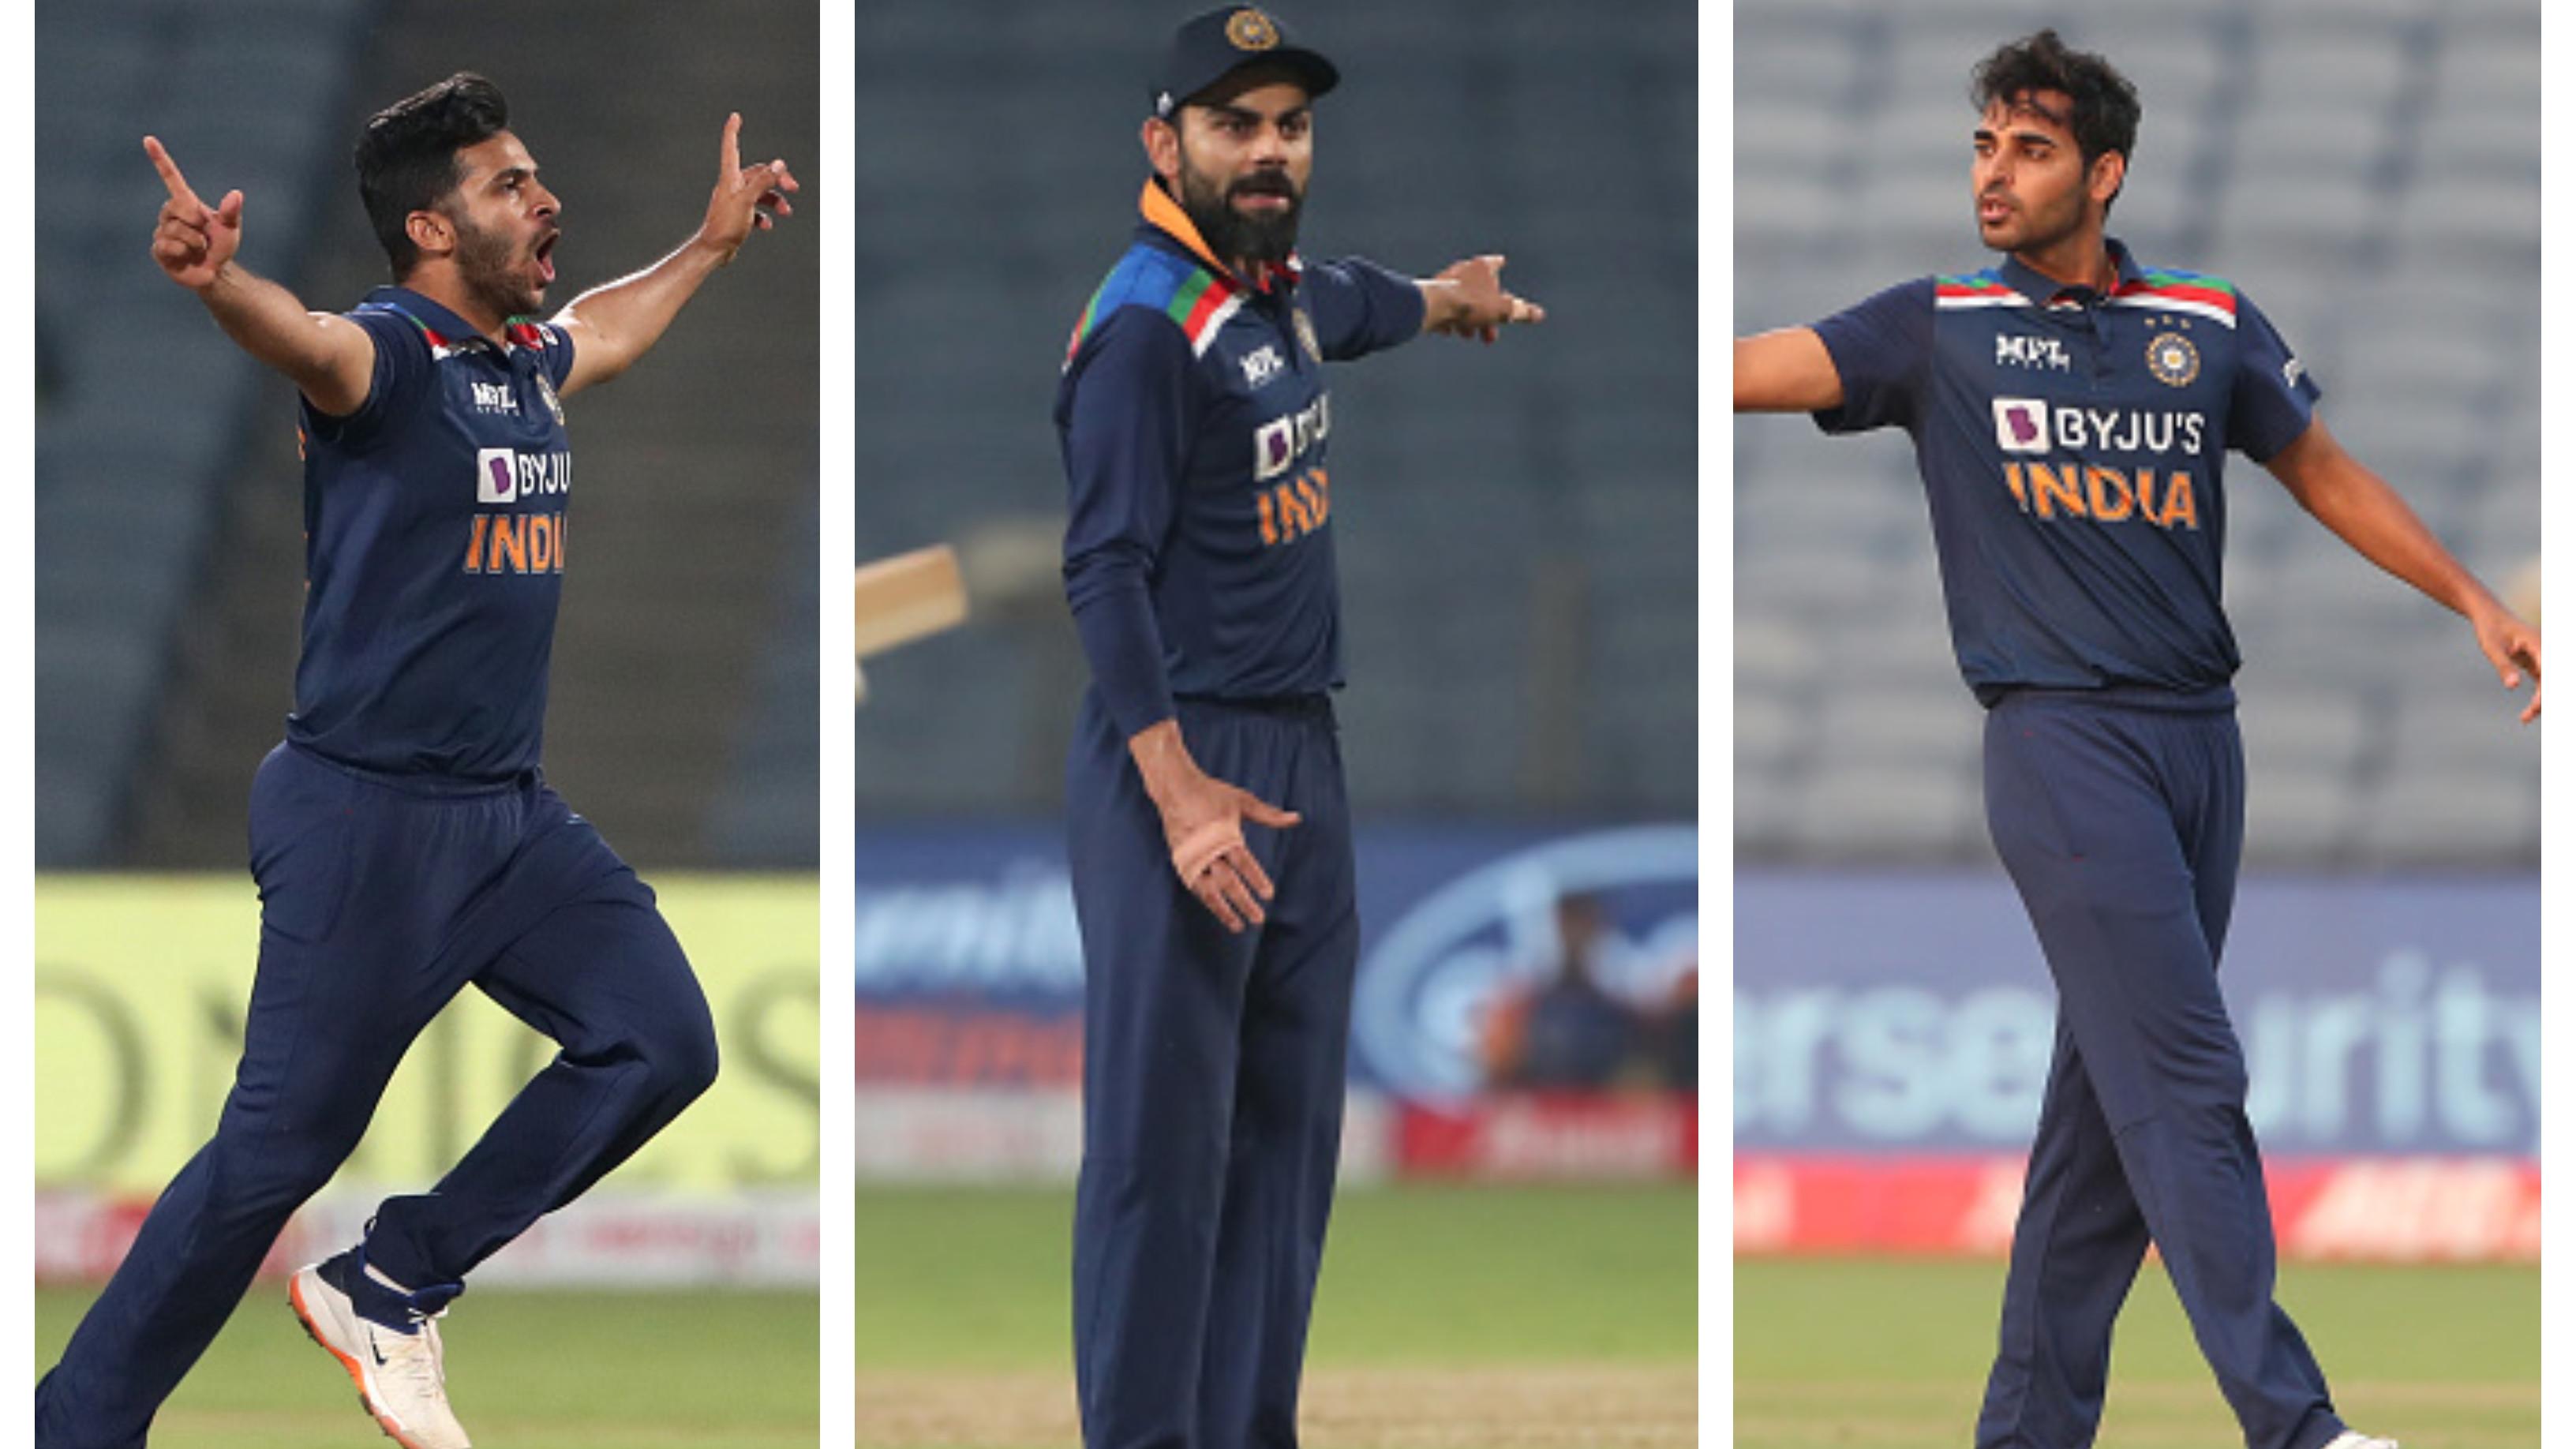 IND v ENG 2021: Virat Kohli surprised as Shardul, Bhuvneshwar didn't win major awards after India's ODI series win